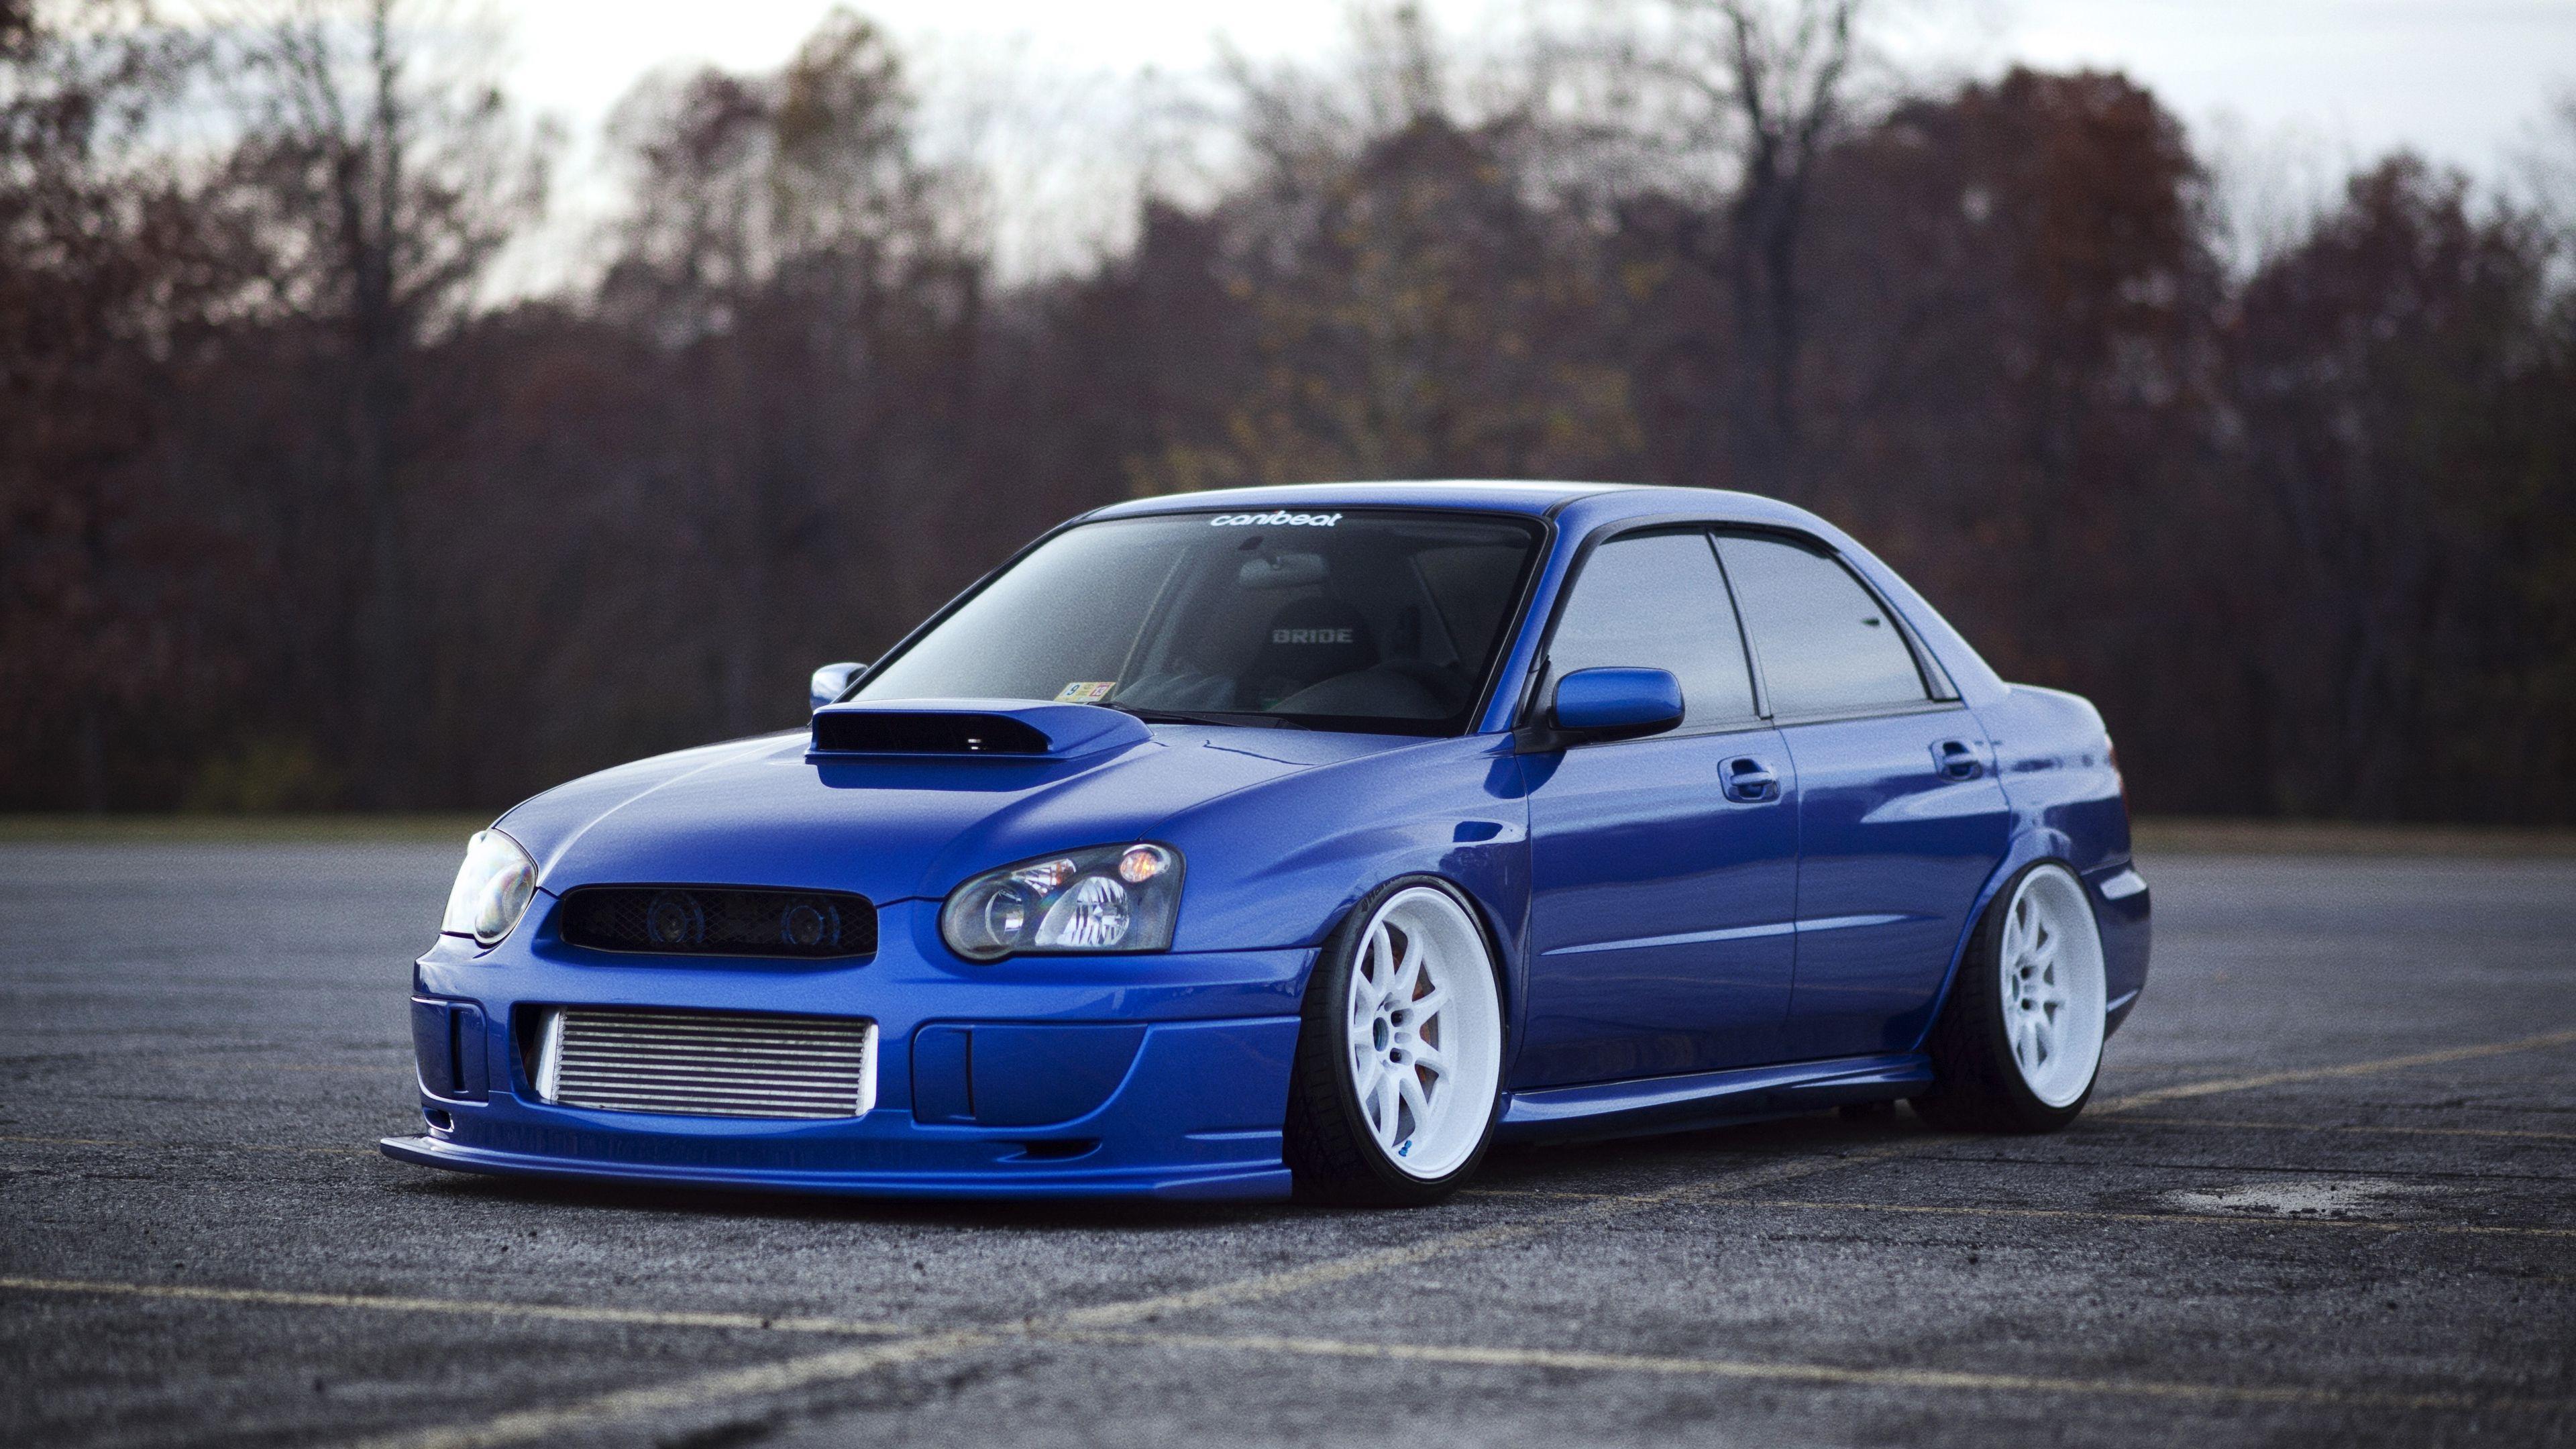 Subaru Impreza Wrx Sti Subaru Tuning Blue 4k Wrx Sti Subaru